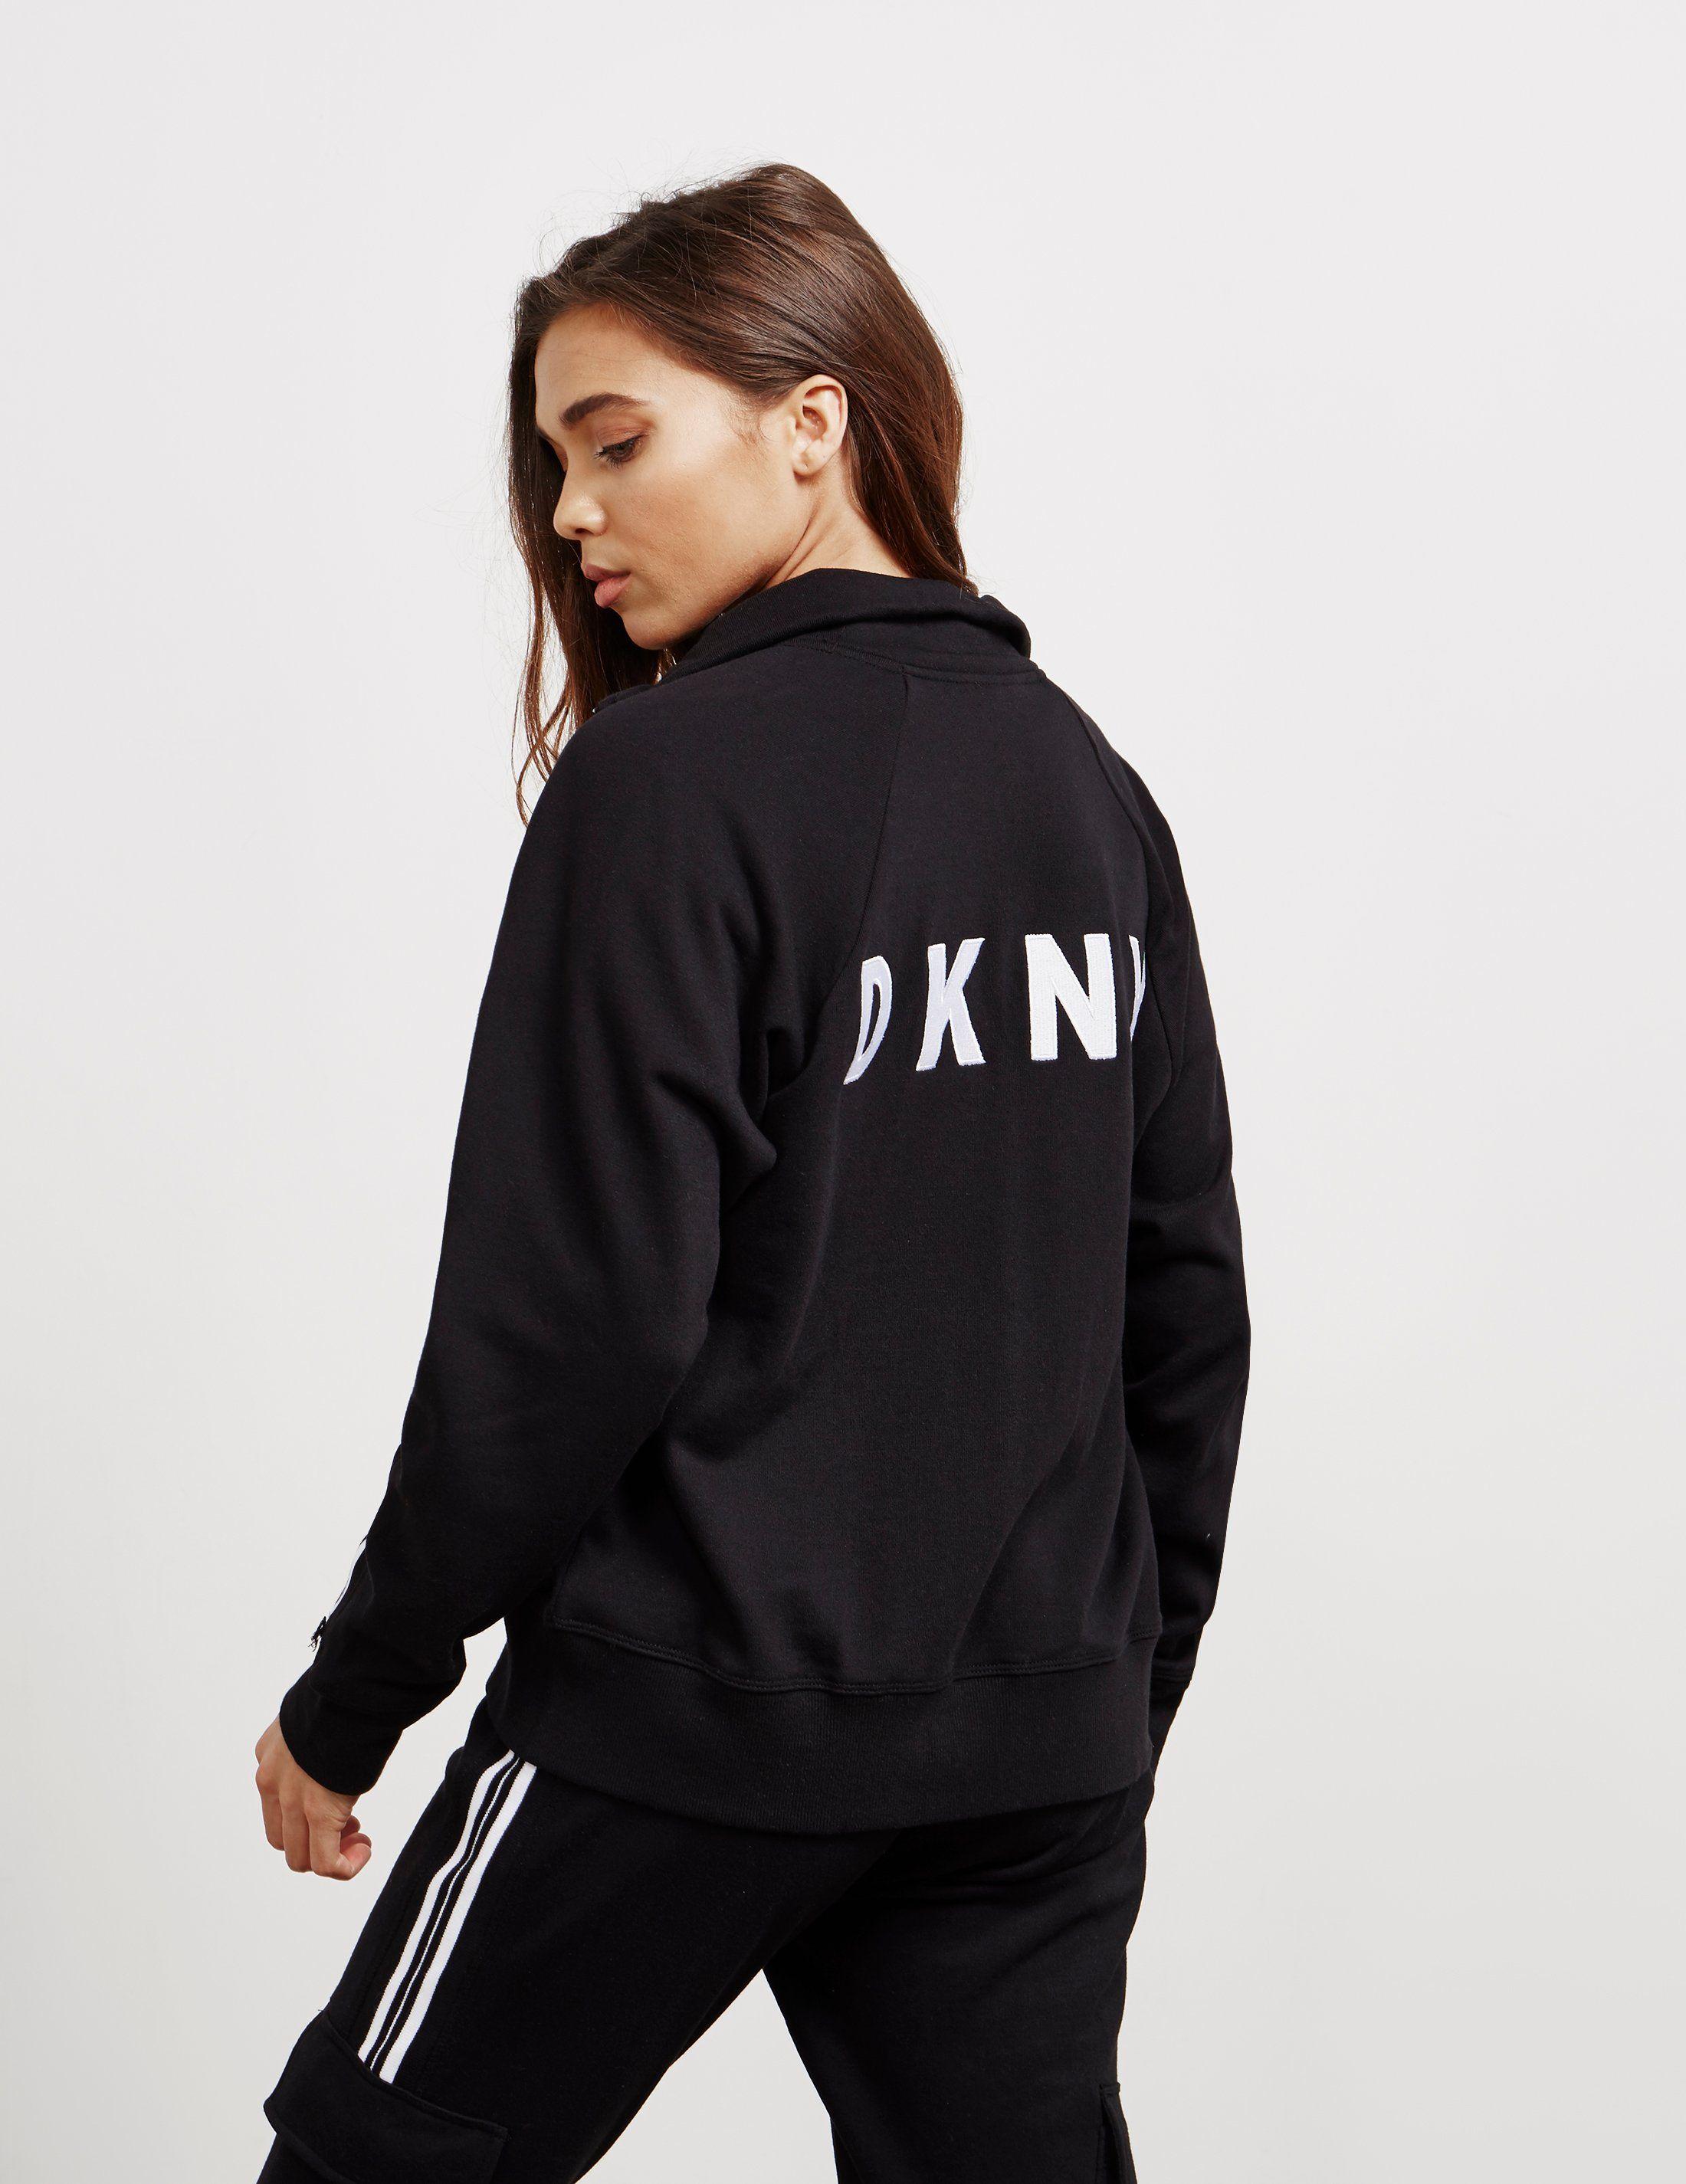 DKNY Full Zip Track Top